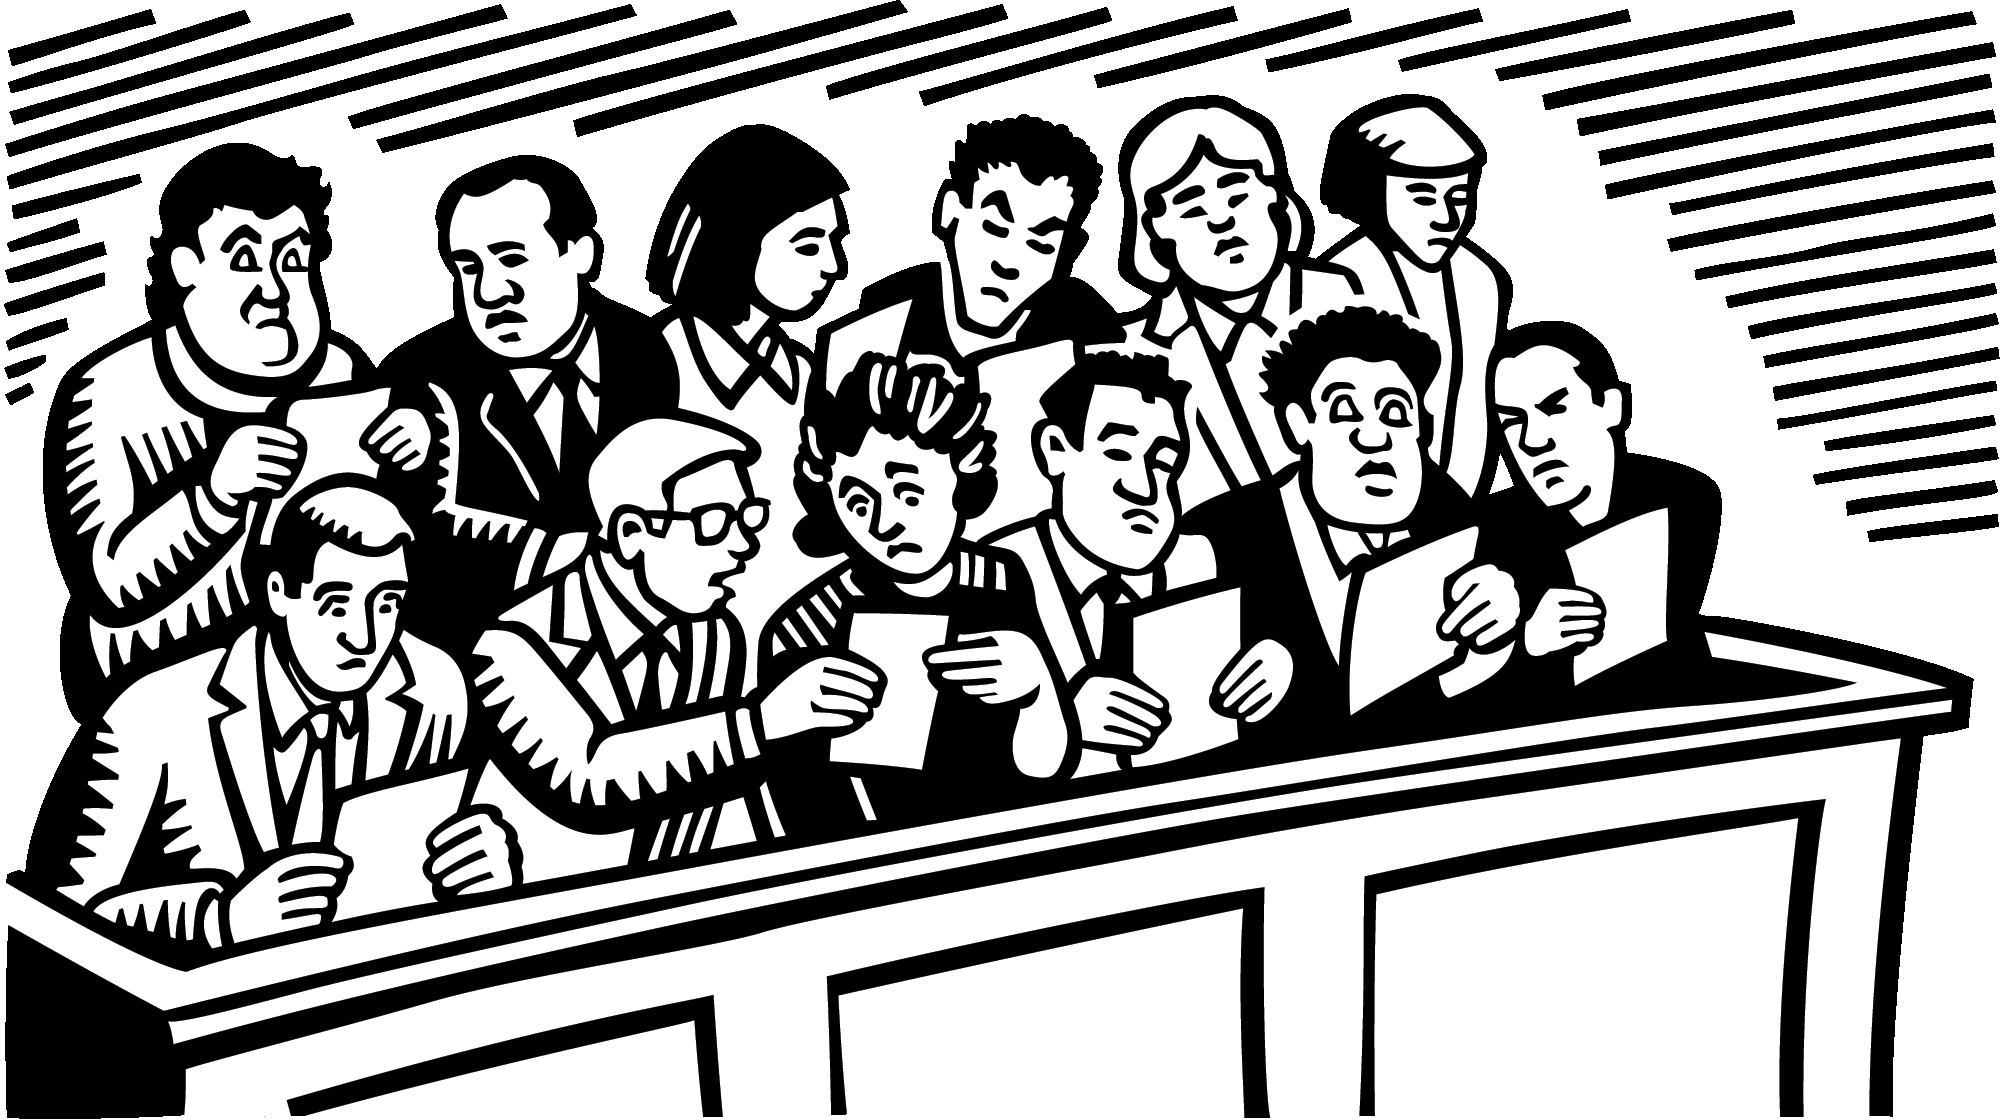 Jury Box Clipart.